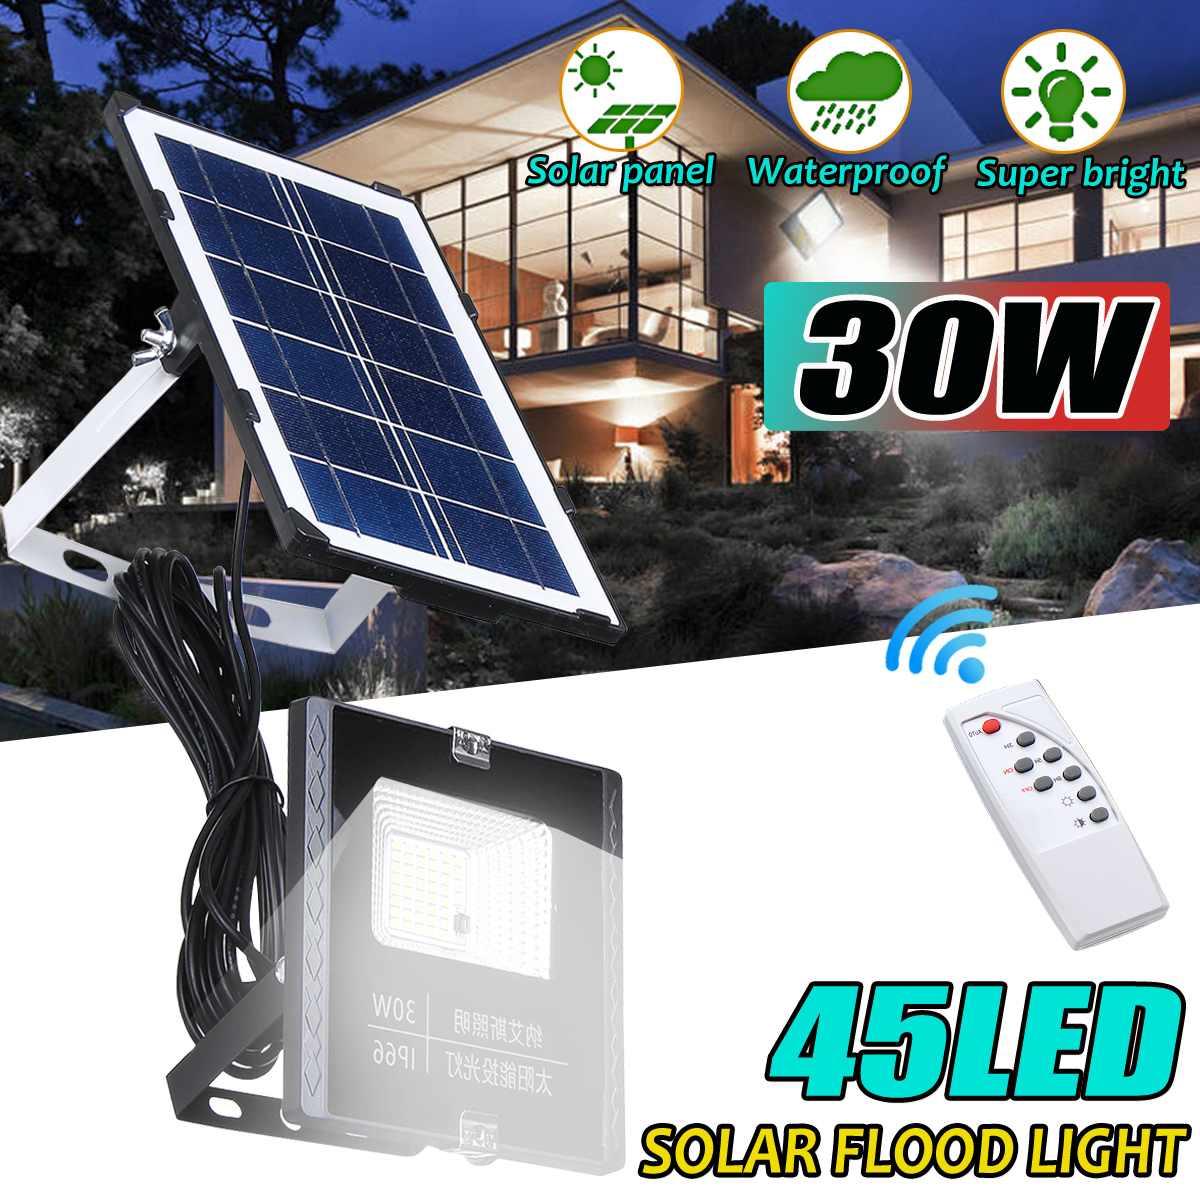 30W Solar Floodlight 45 Led Portable Spotlight floodlight Outdoor Street Garden Light Waterproof Wall Lamp with Remote Control